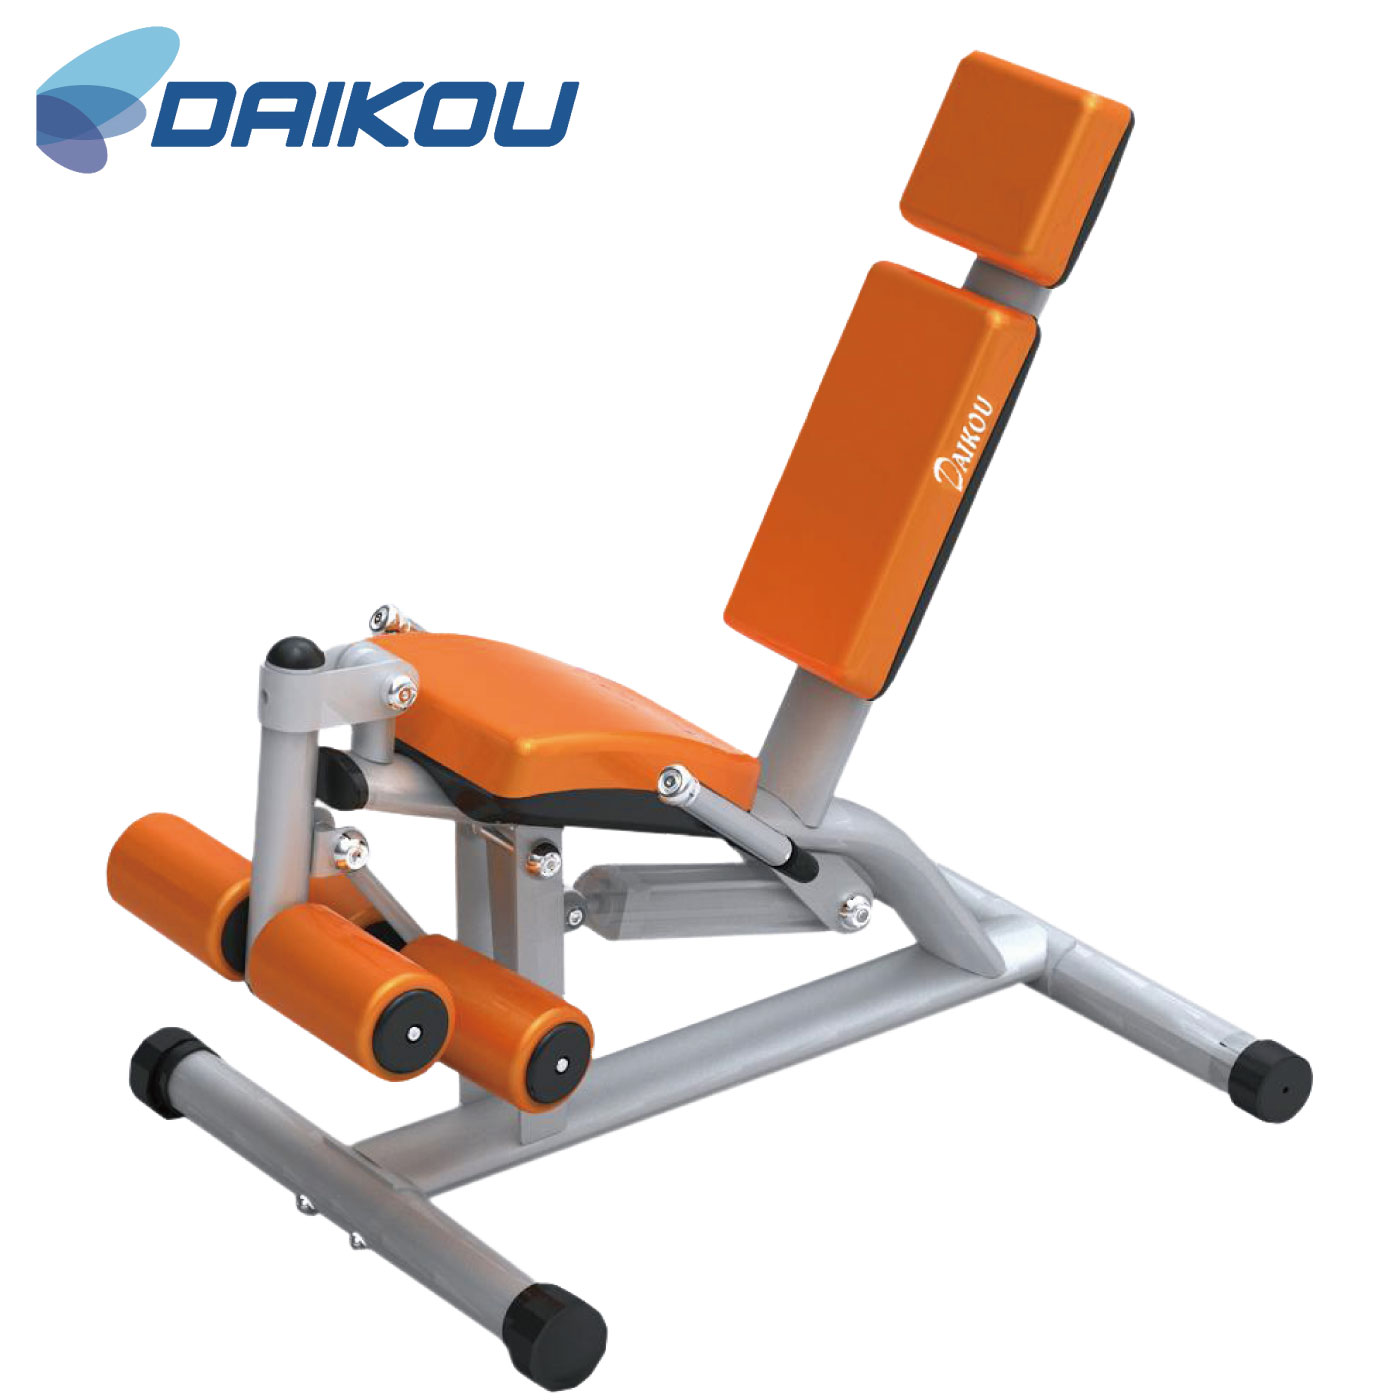 DK-1205(レッグカール・エクステンション)/準業務用油圧マシン《DAIKOU(ダイコー)》